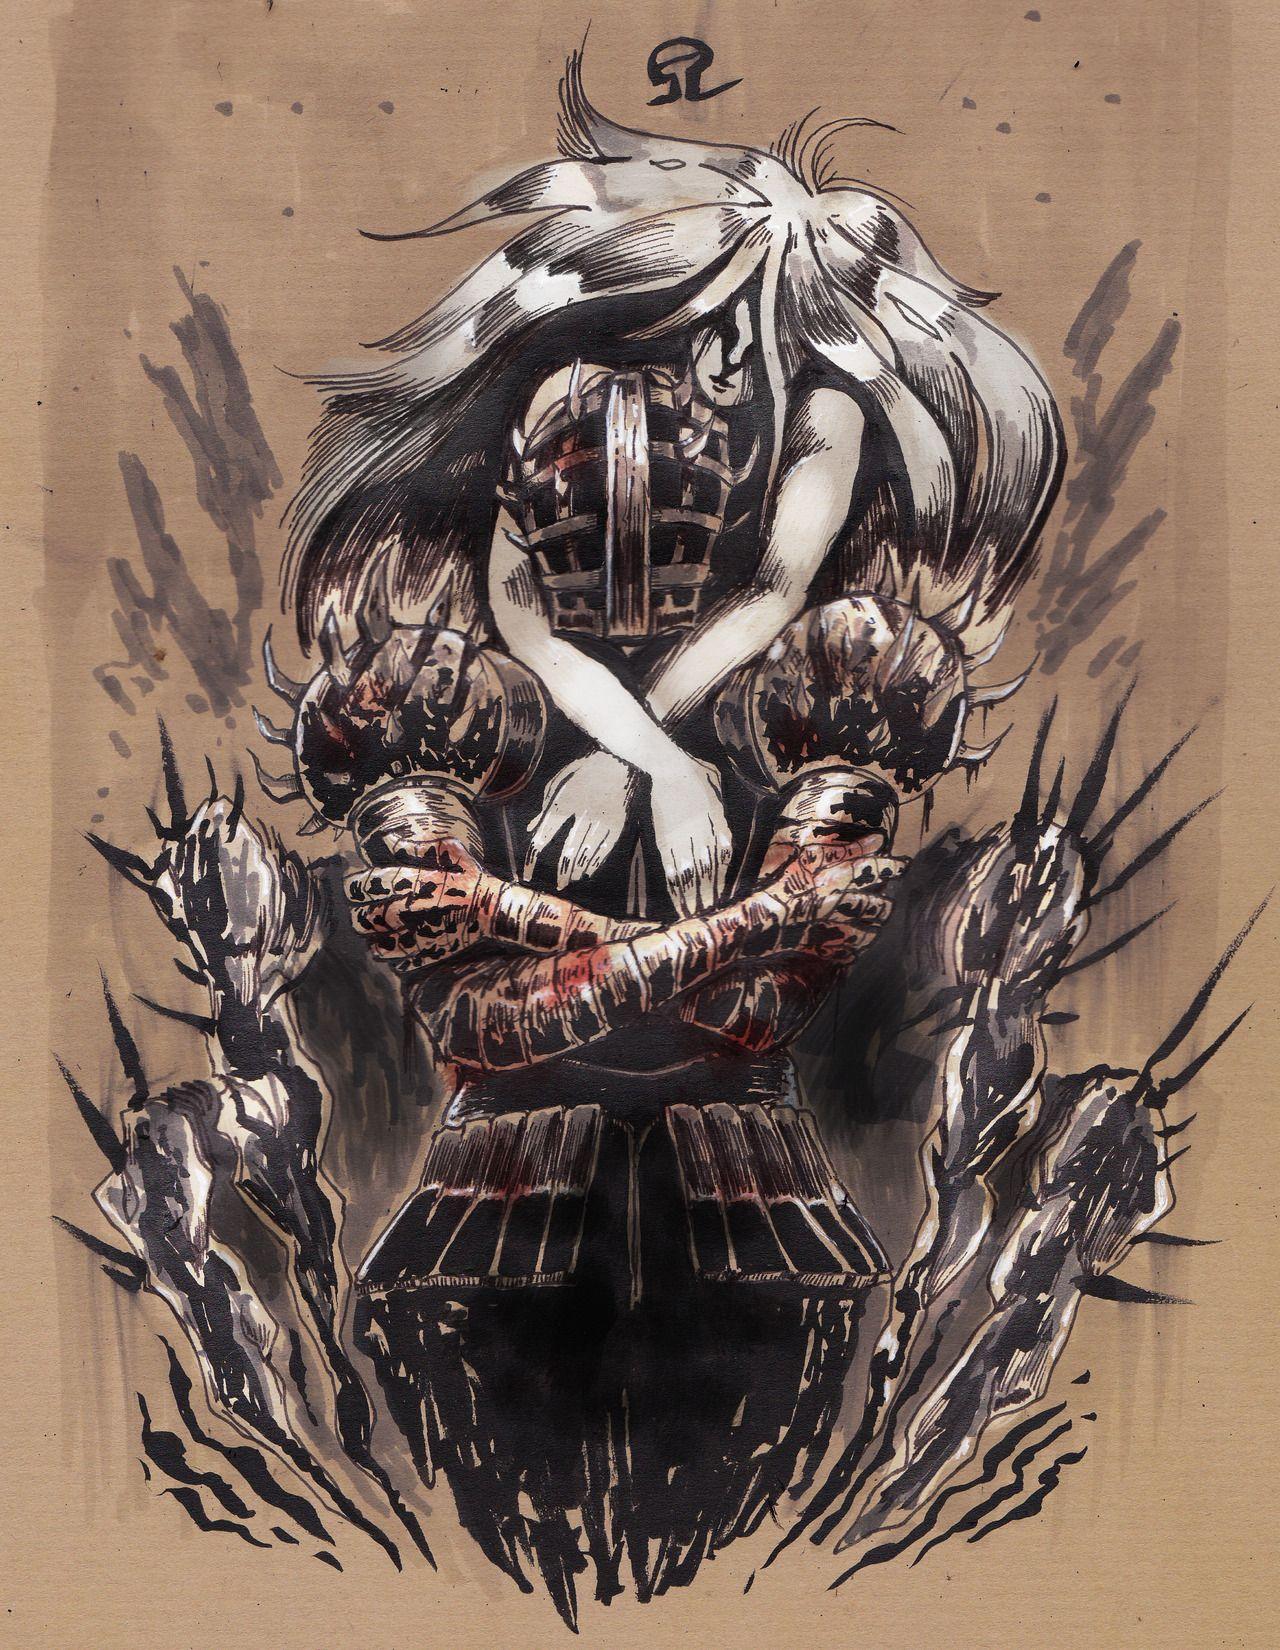 The One Who Craves Souls Alvh Omega Kirk And The Fair Lady Dark Souls Characters Dark Souls Dark Souls Art